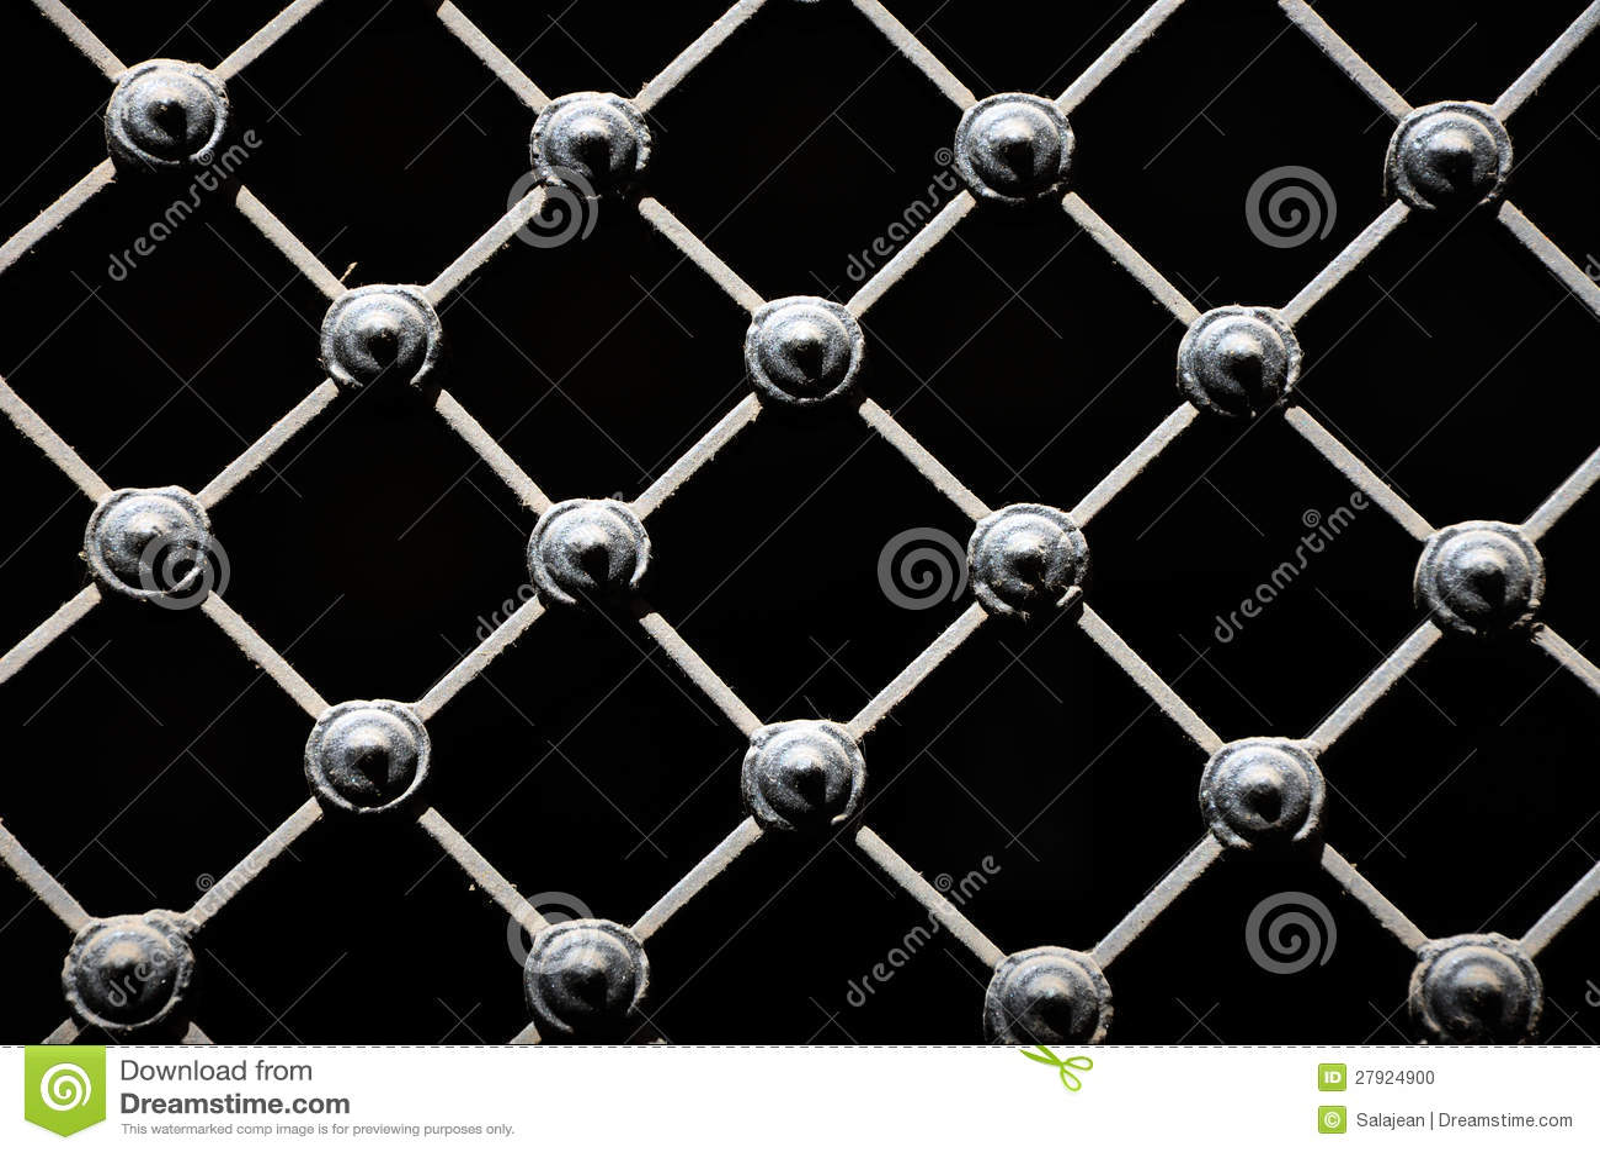 Wrought Iron Lattice Stock Photo Image 27924900